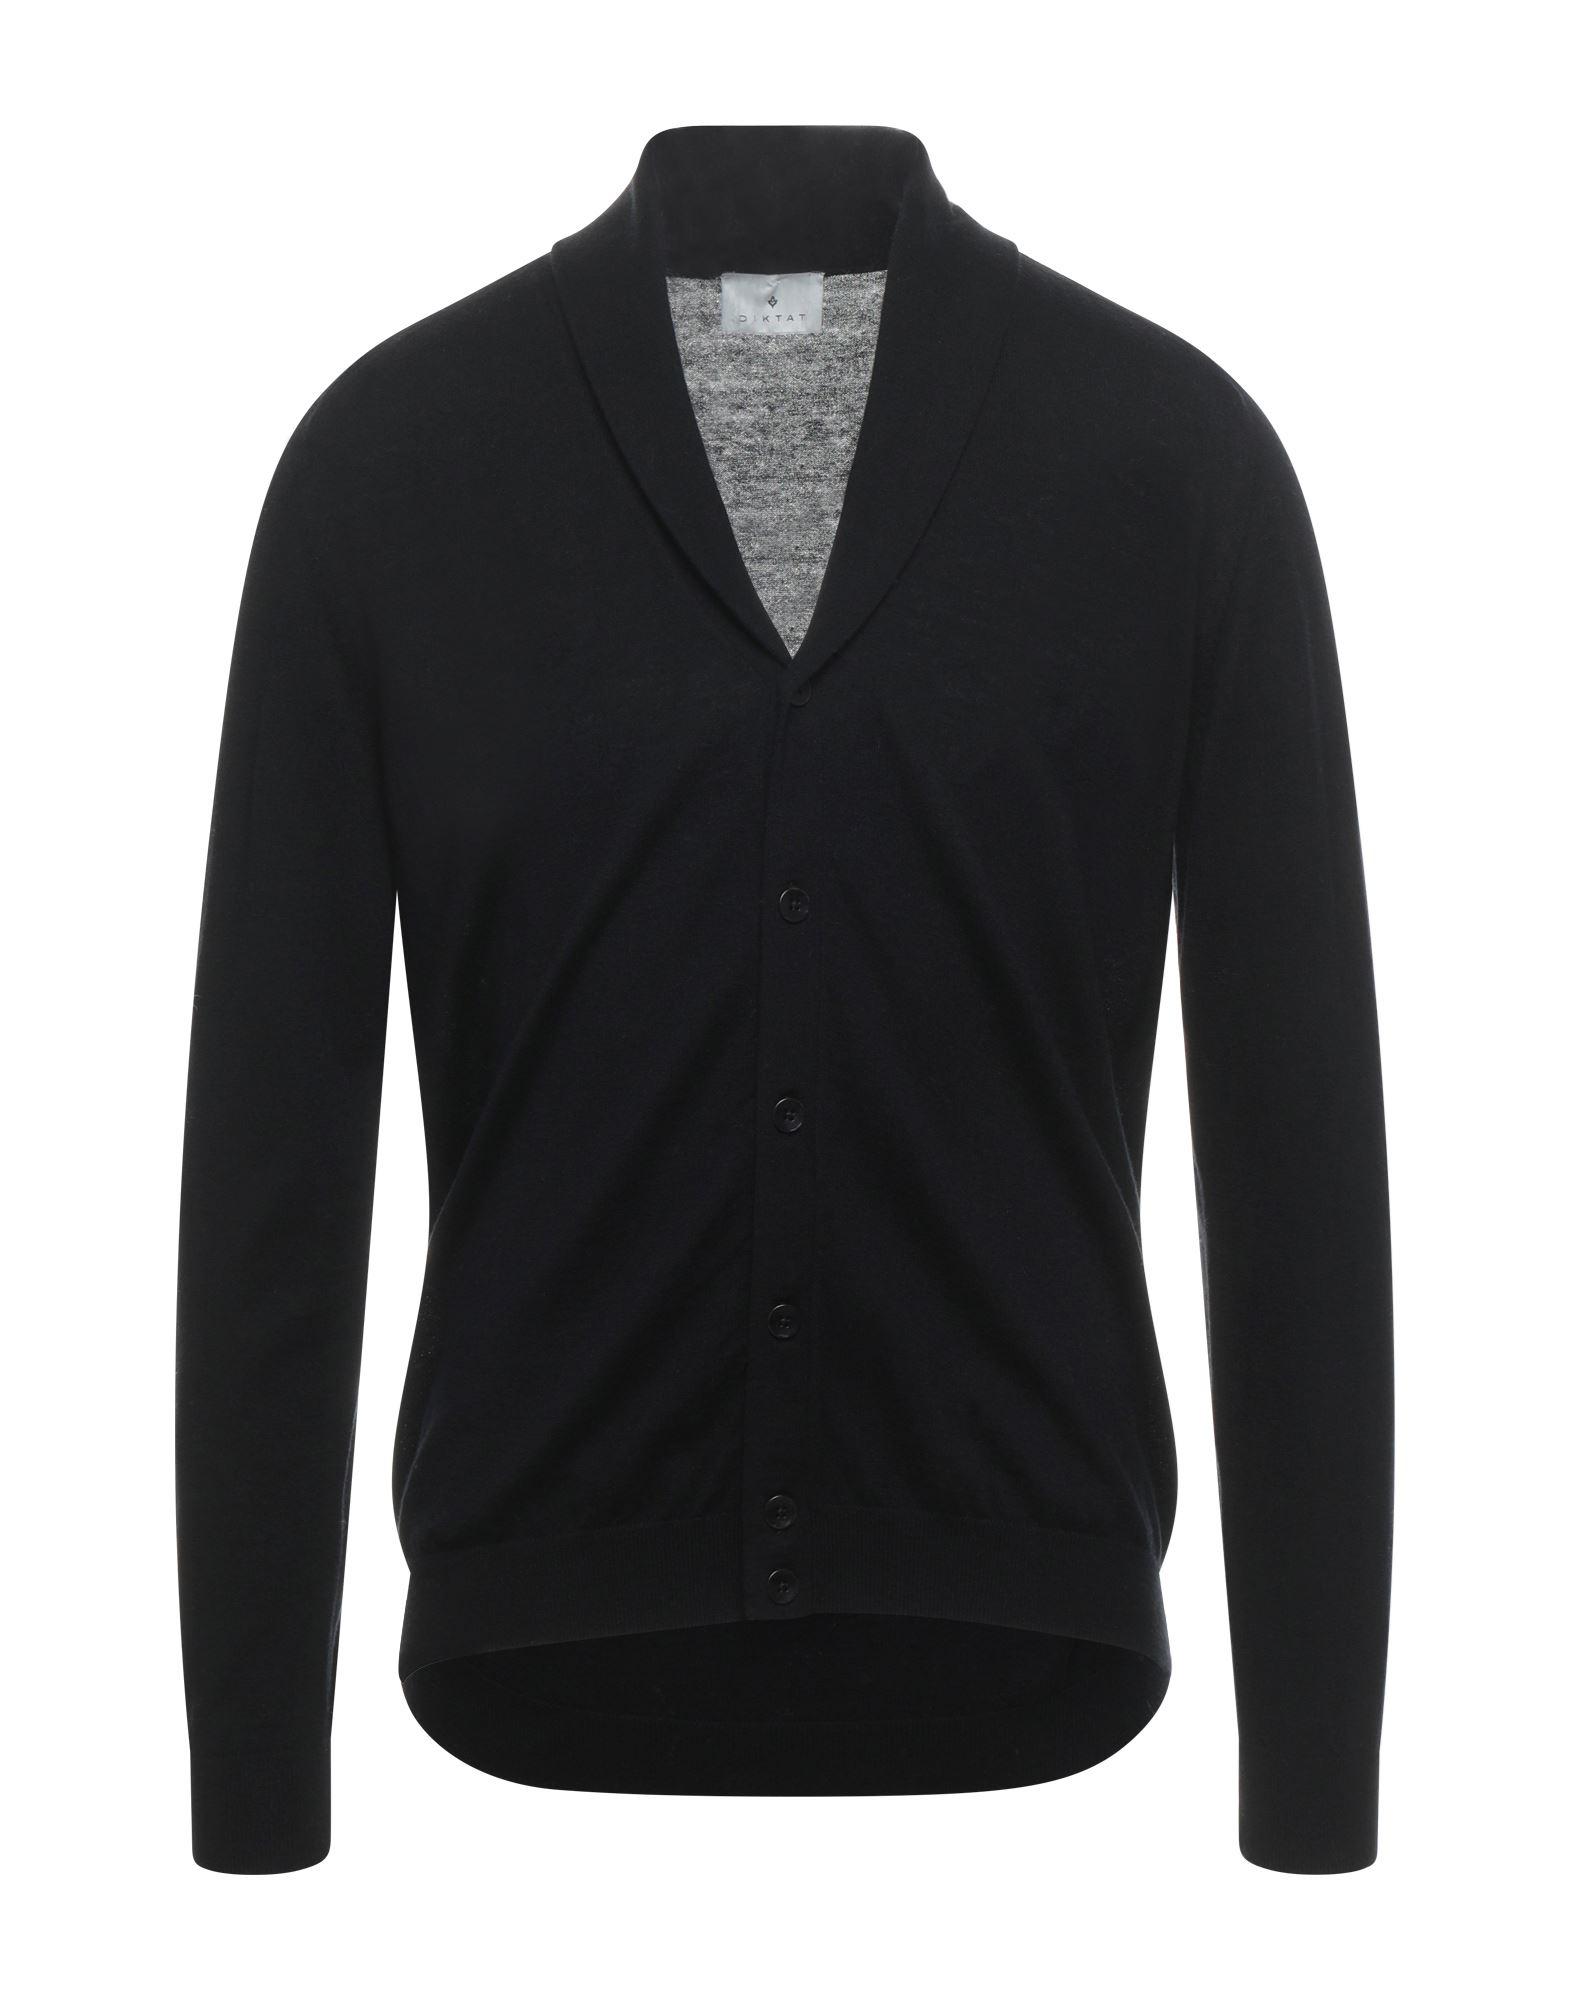 Diktat Cardigans In Black